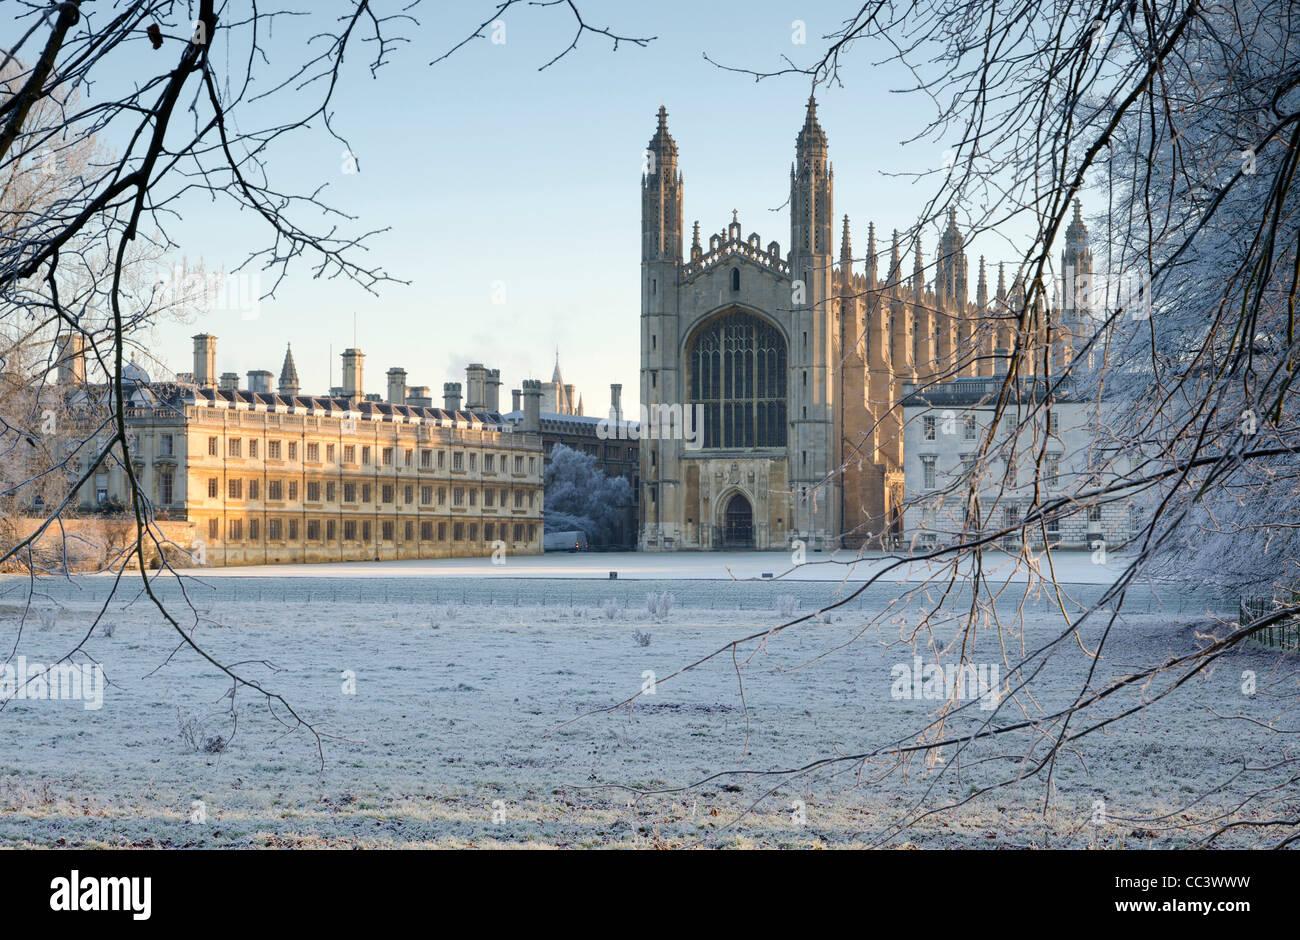 UK, England, Cambridgeshire, Cambridge, The Backs, King's College Chapel in winter Stock Photo